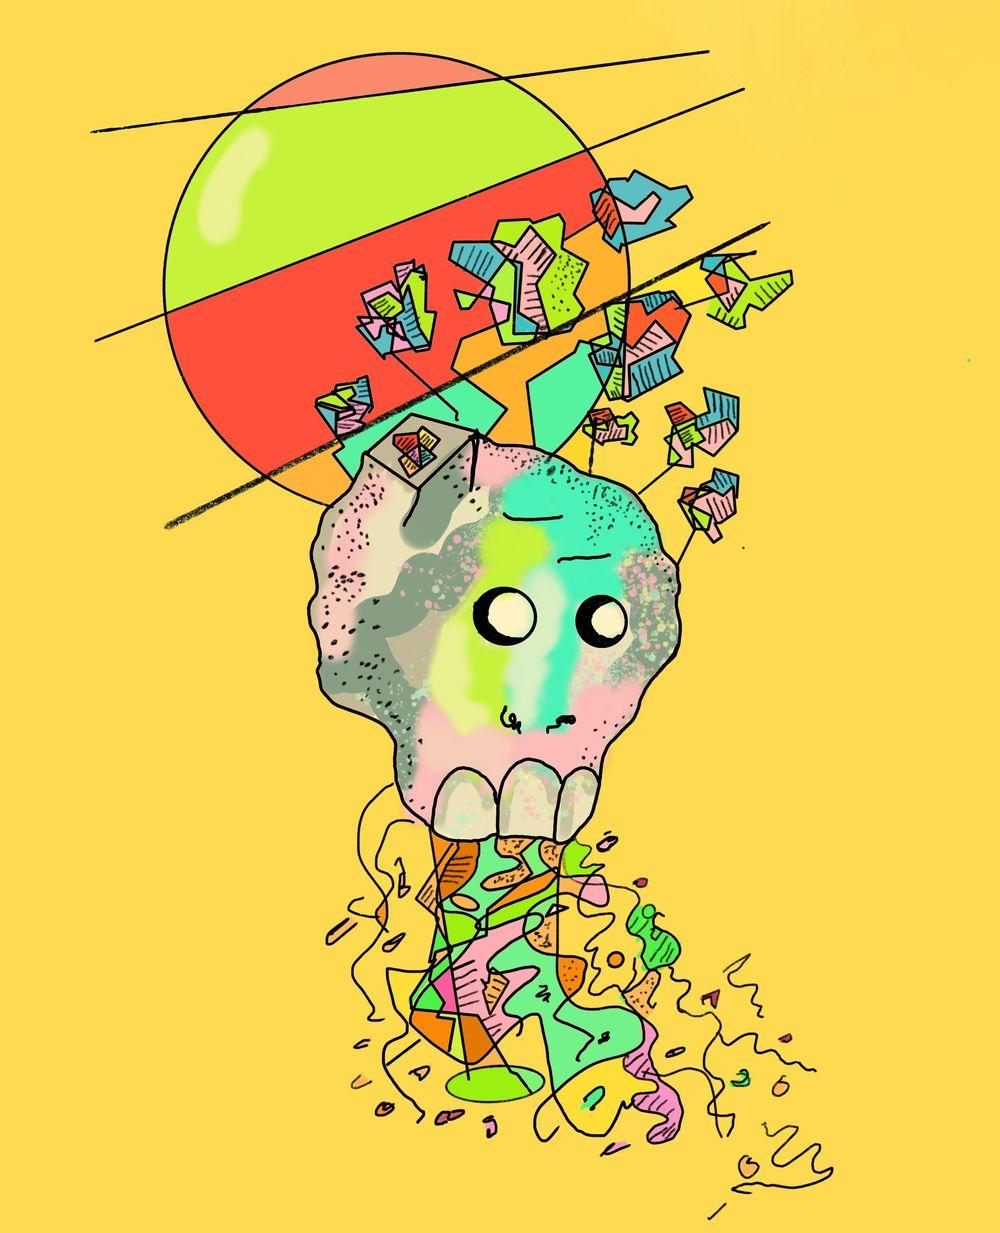 flower skull - image 1 - student project